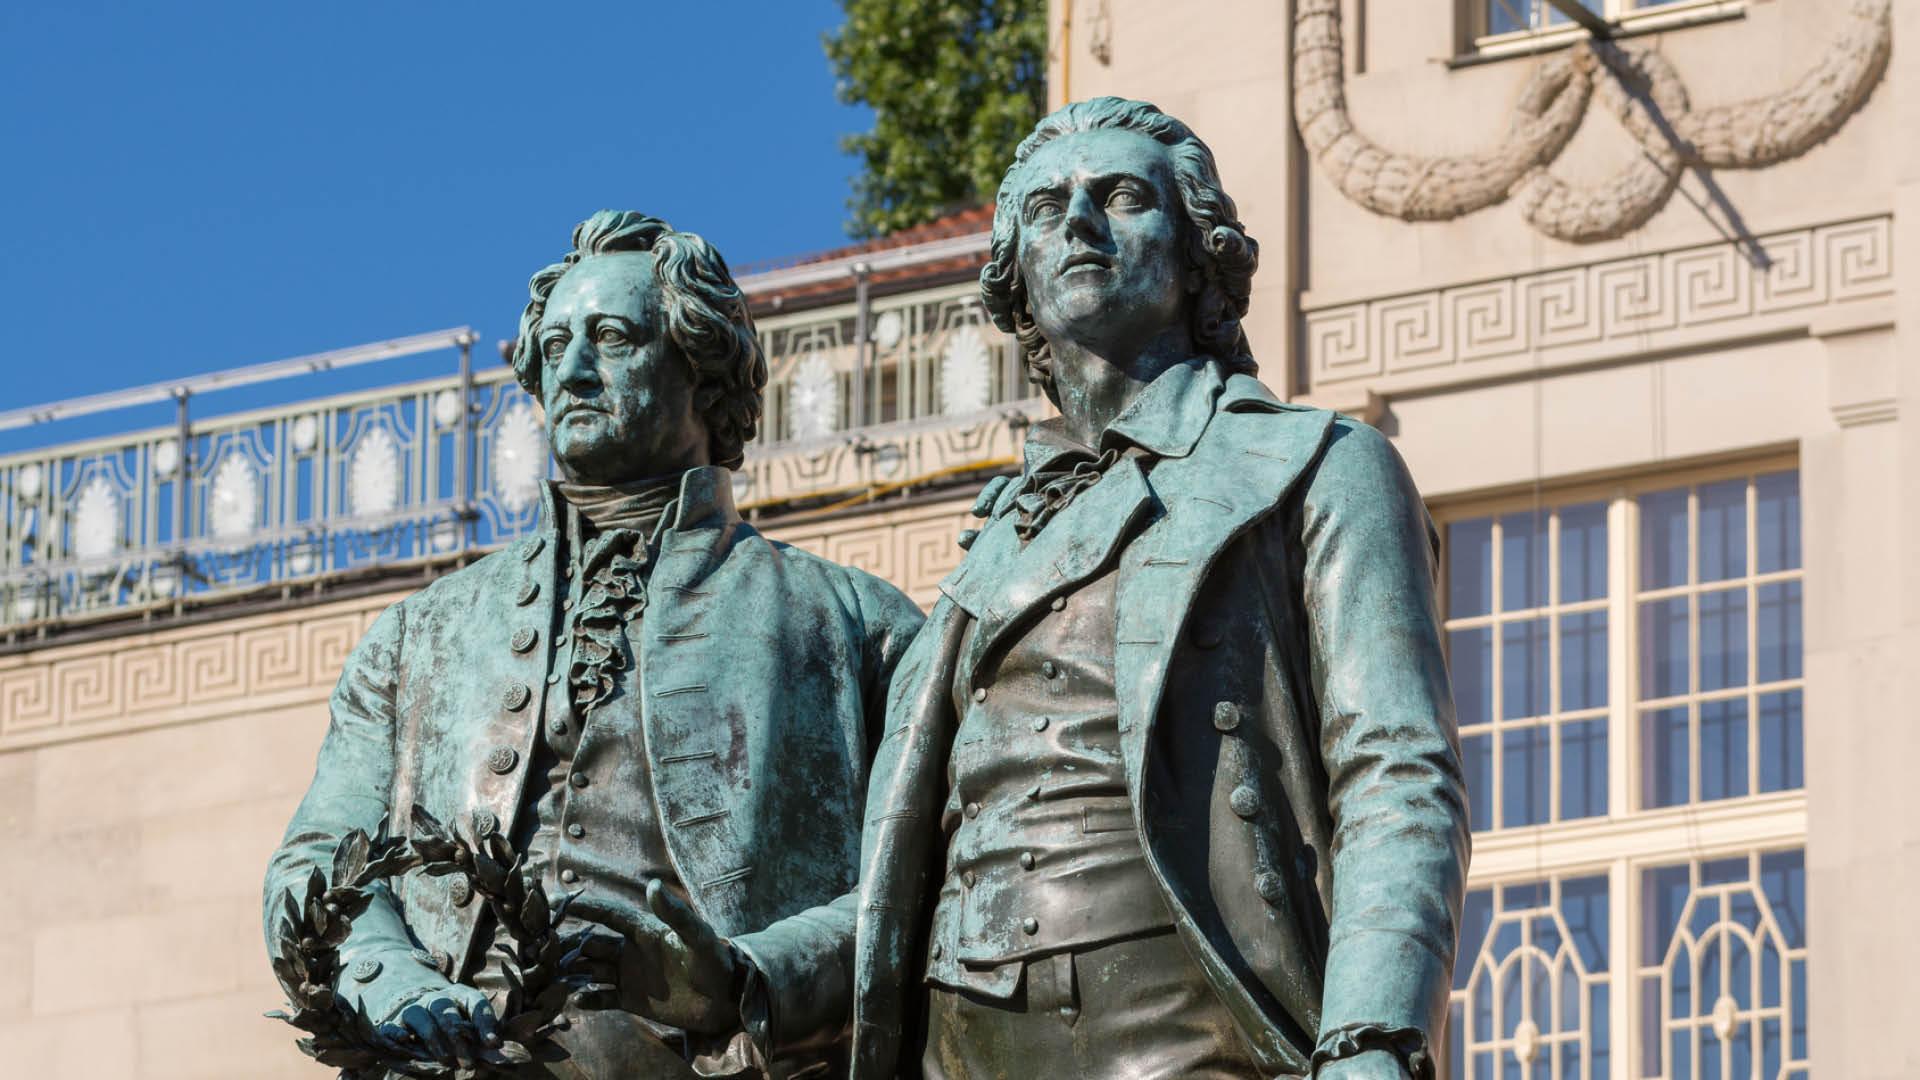 Weimar | Denkmal Schiller & Goethe | Urlaub in Thüringen | Oberhof Hotel Urlaub im Thüringenschanze